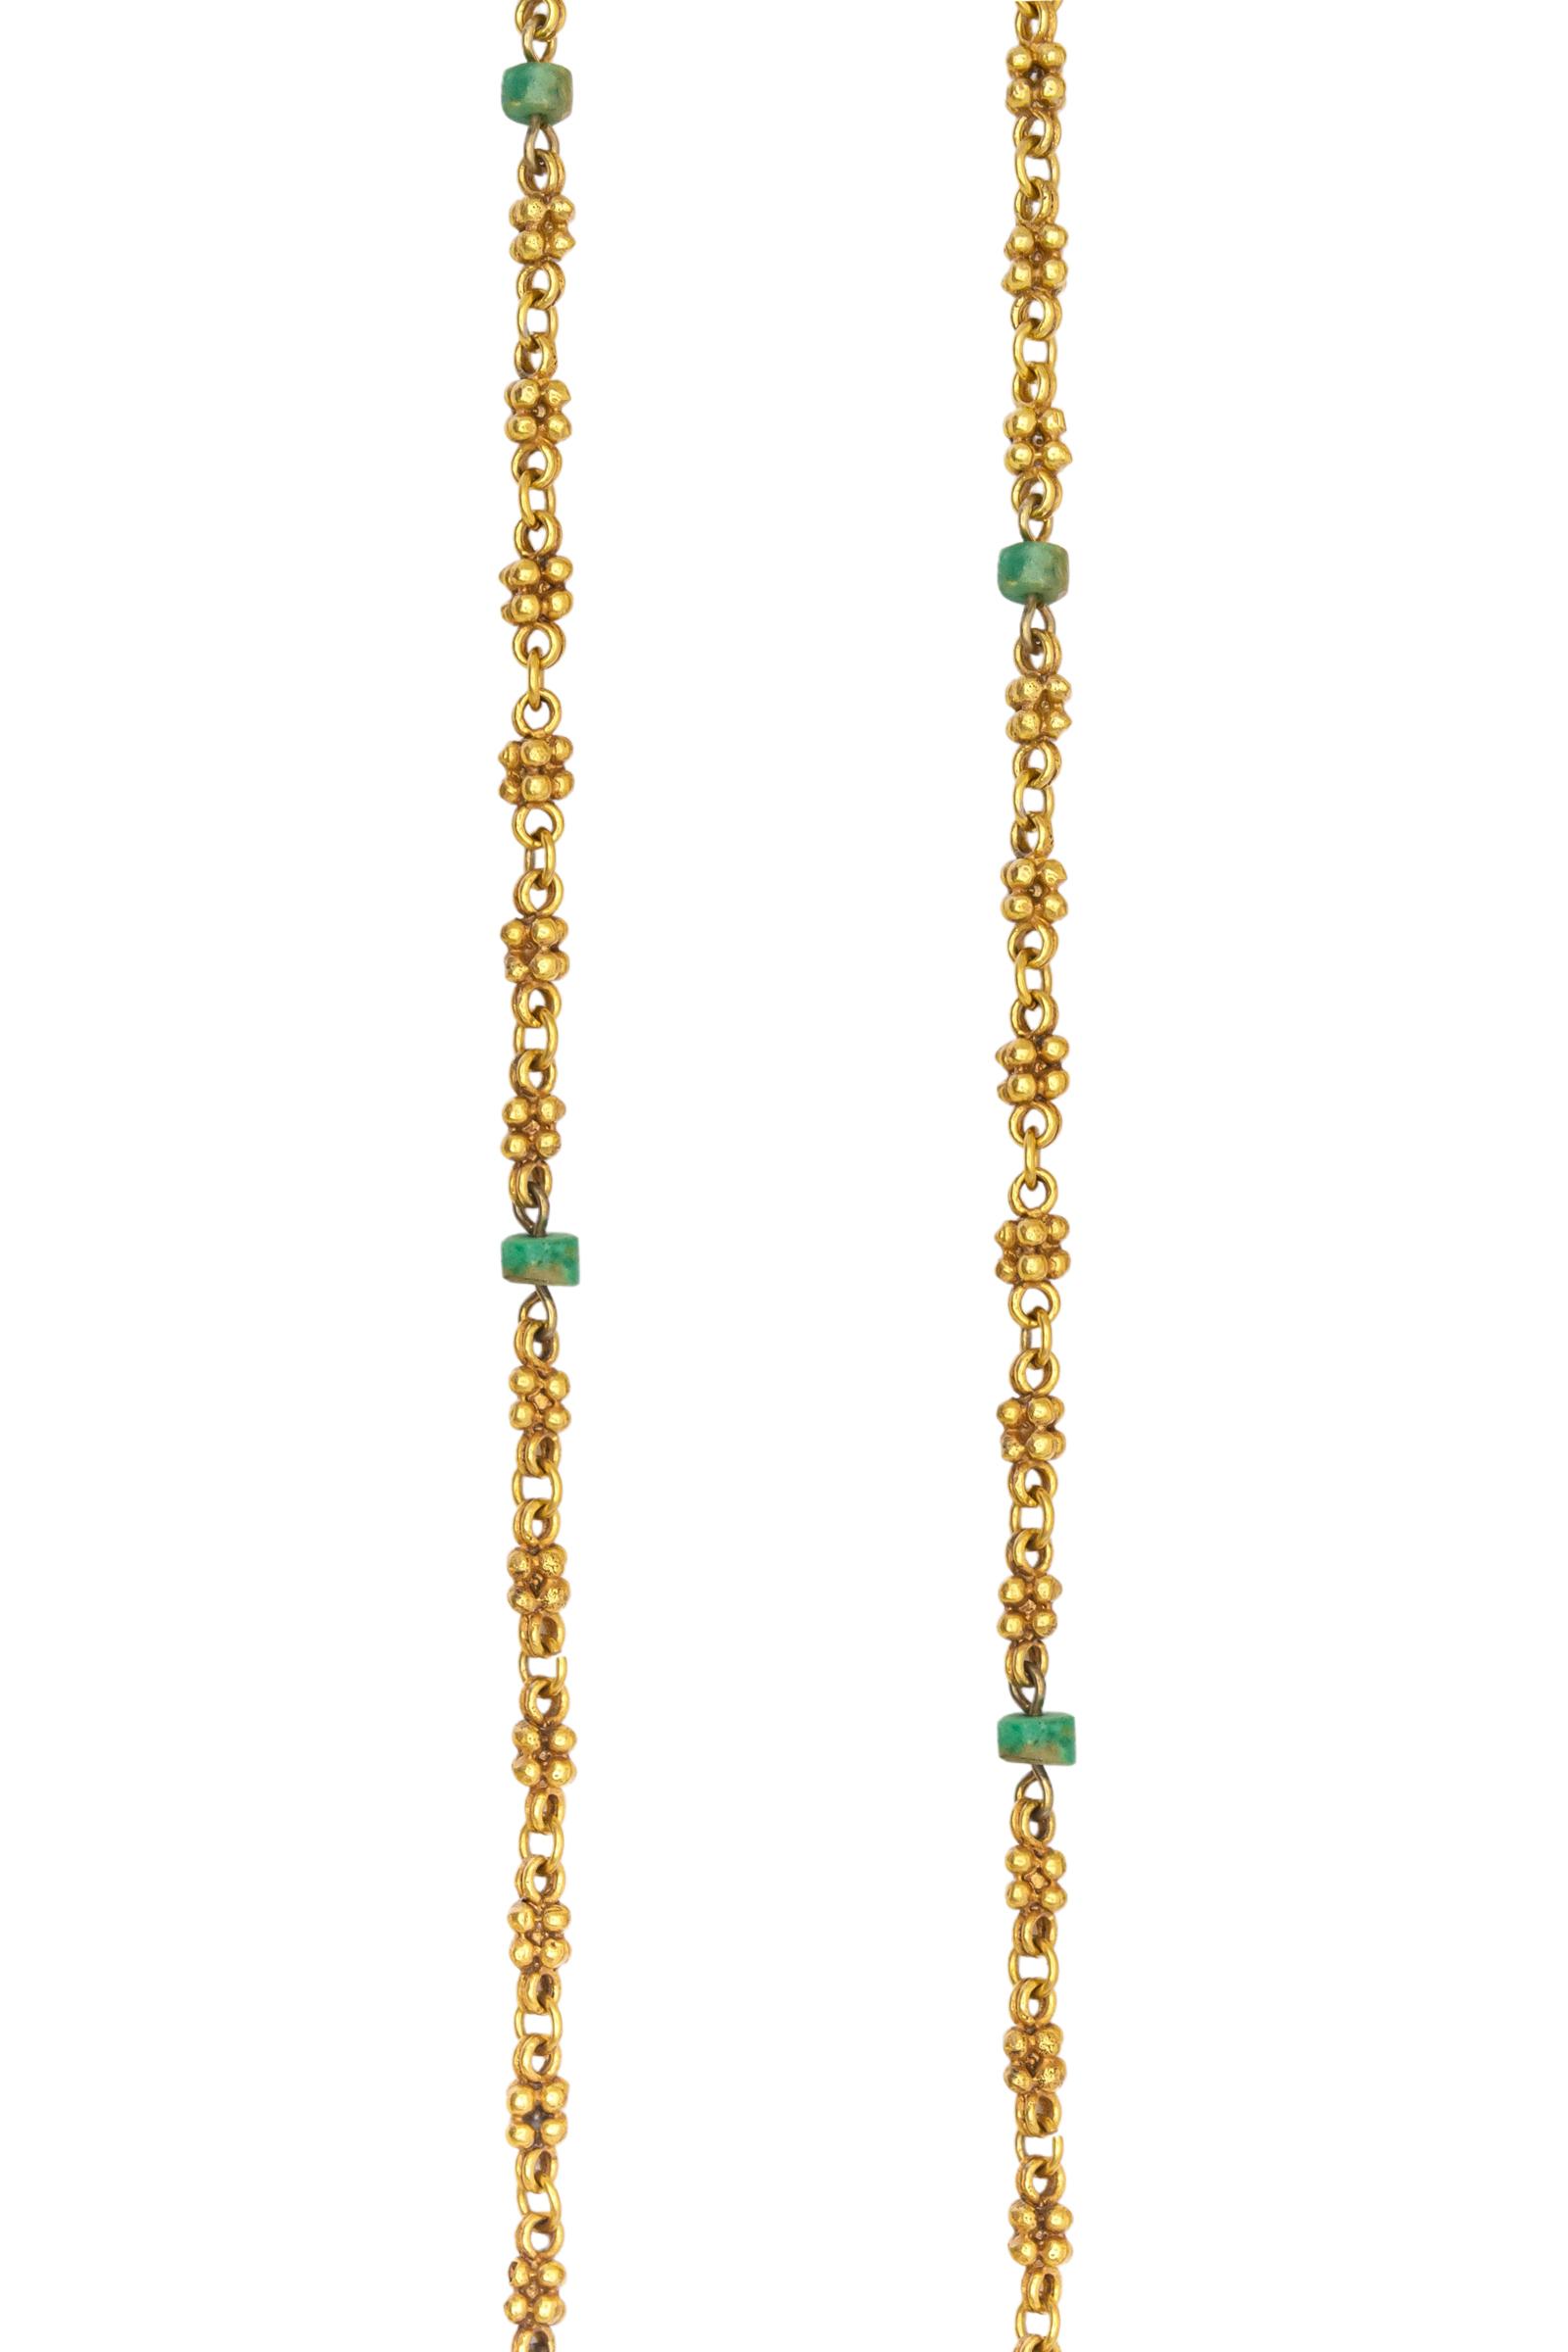 Cadena dorada tejida con murraya-esmeralda